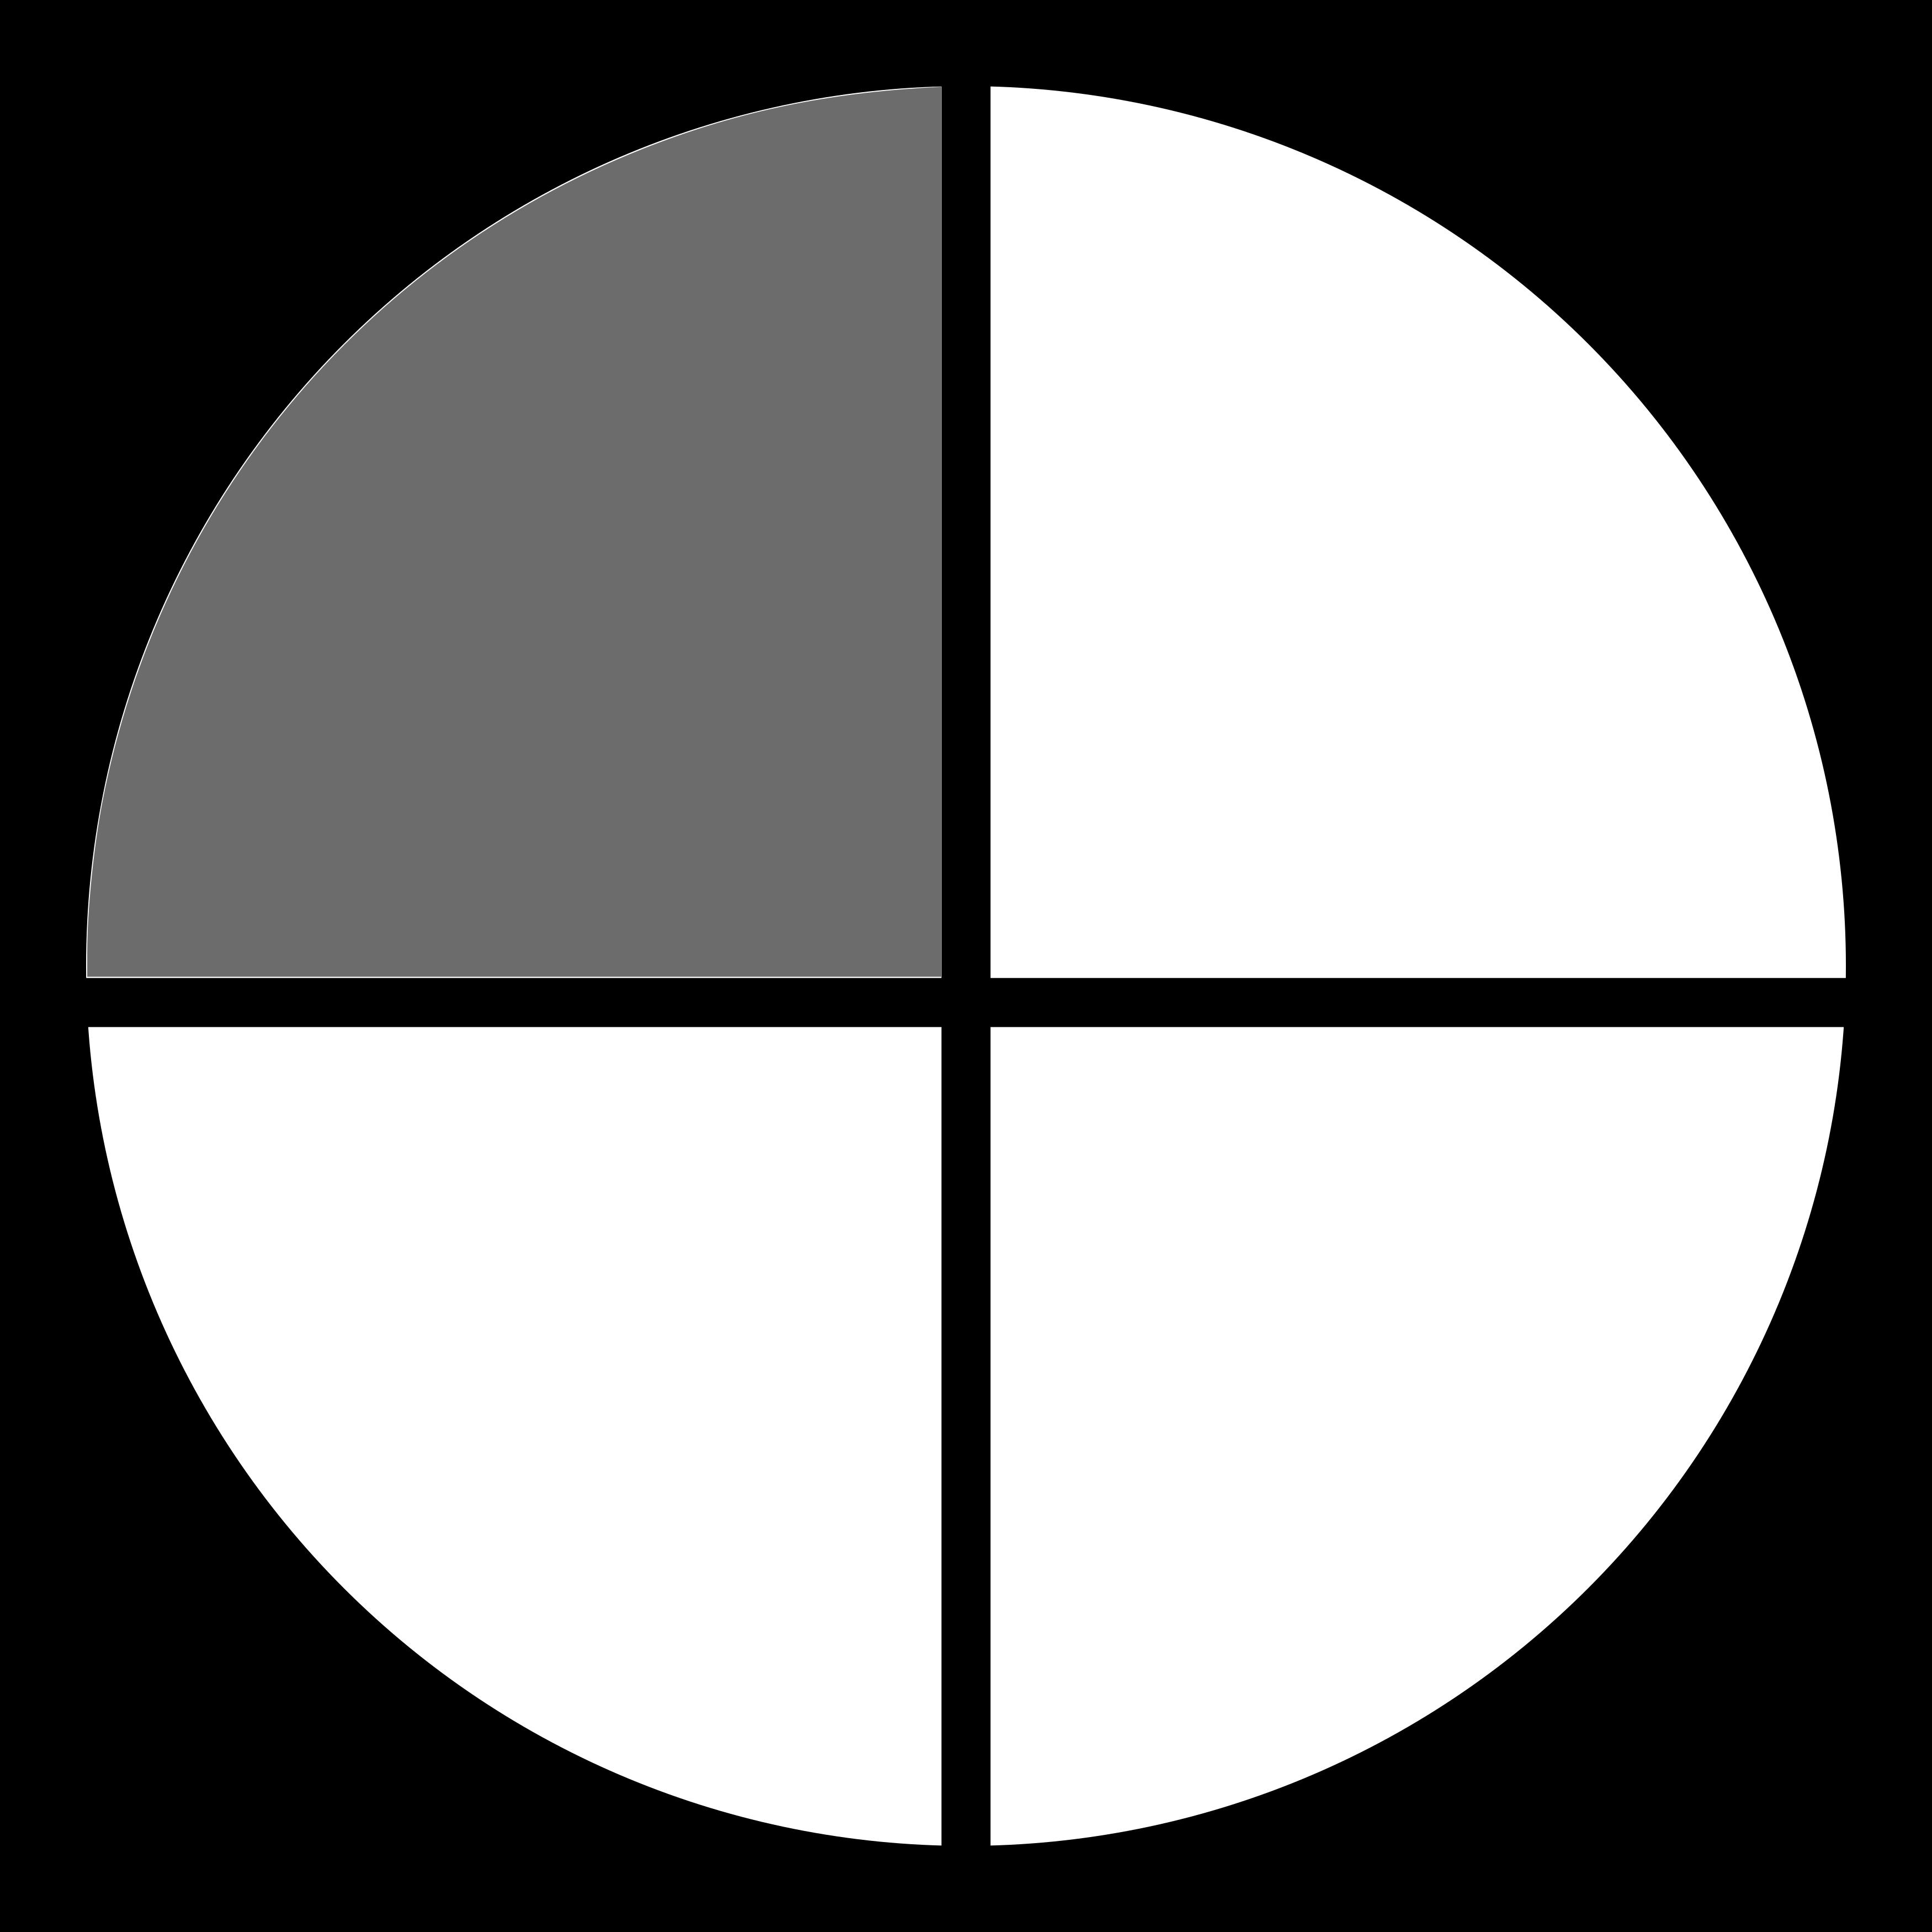 um-quarto-matematica